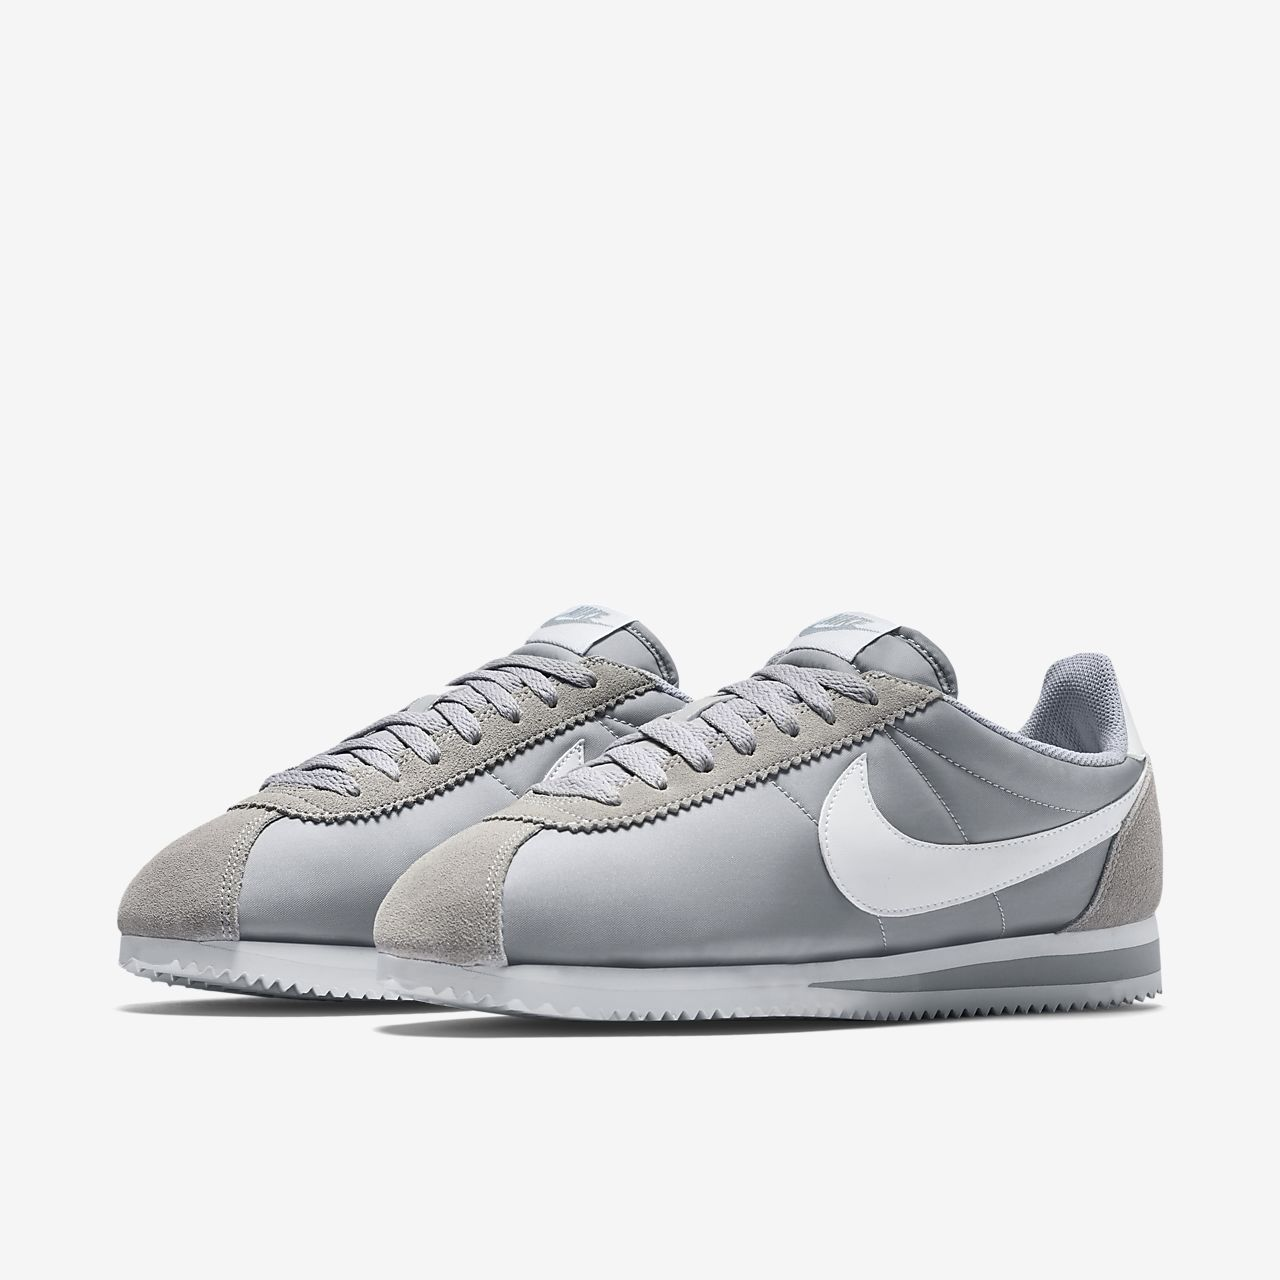 Classic Cortez Nylon Trainers In Grey 807472-010 - Grey Nike eRINXu